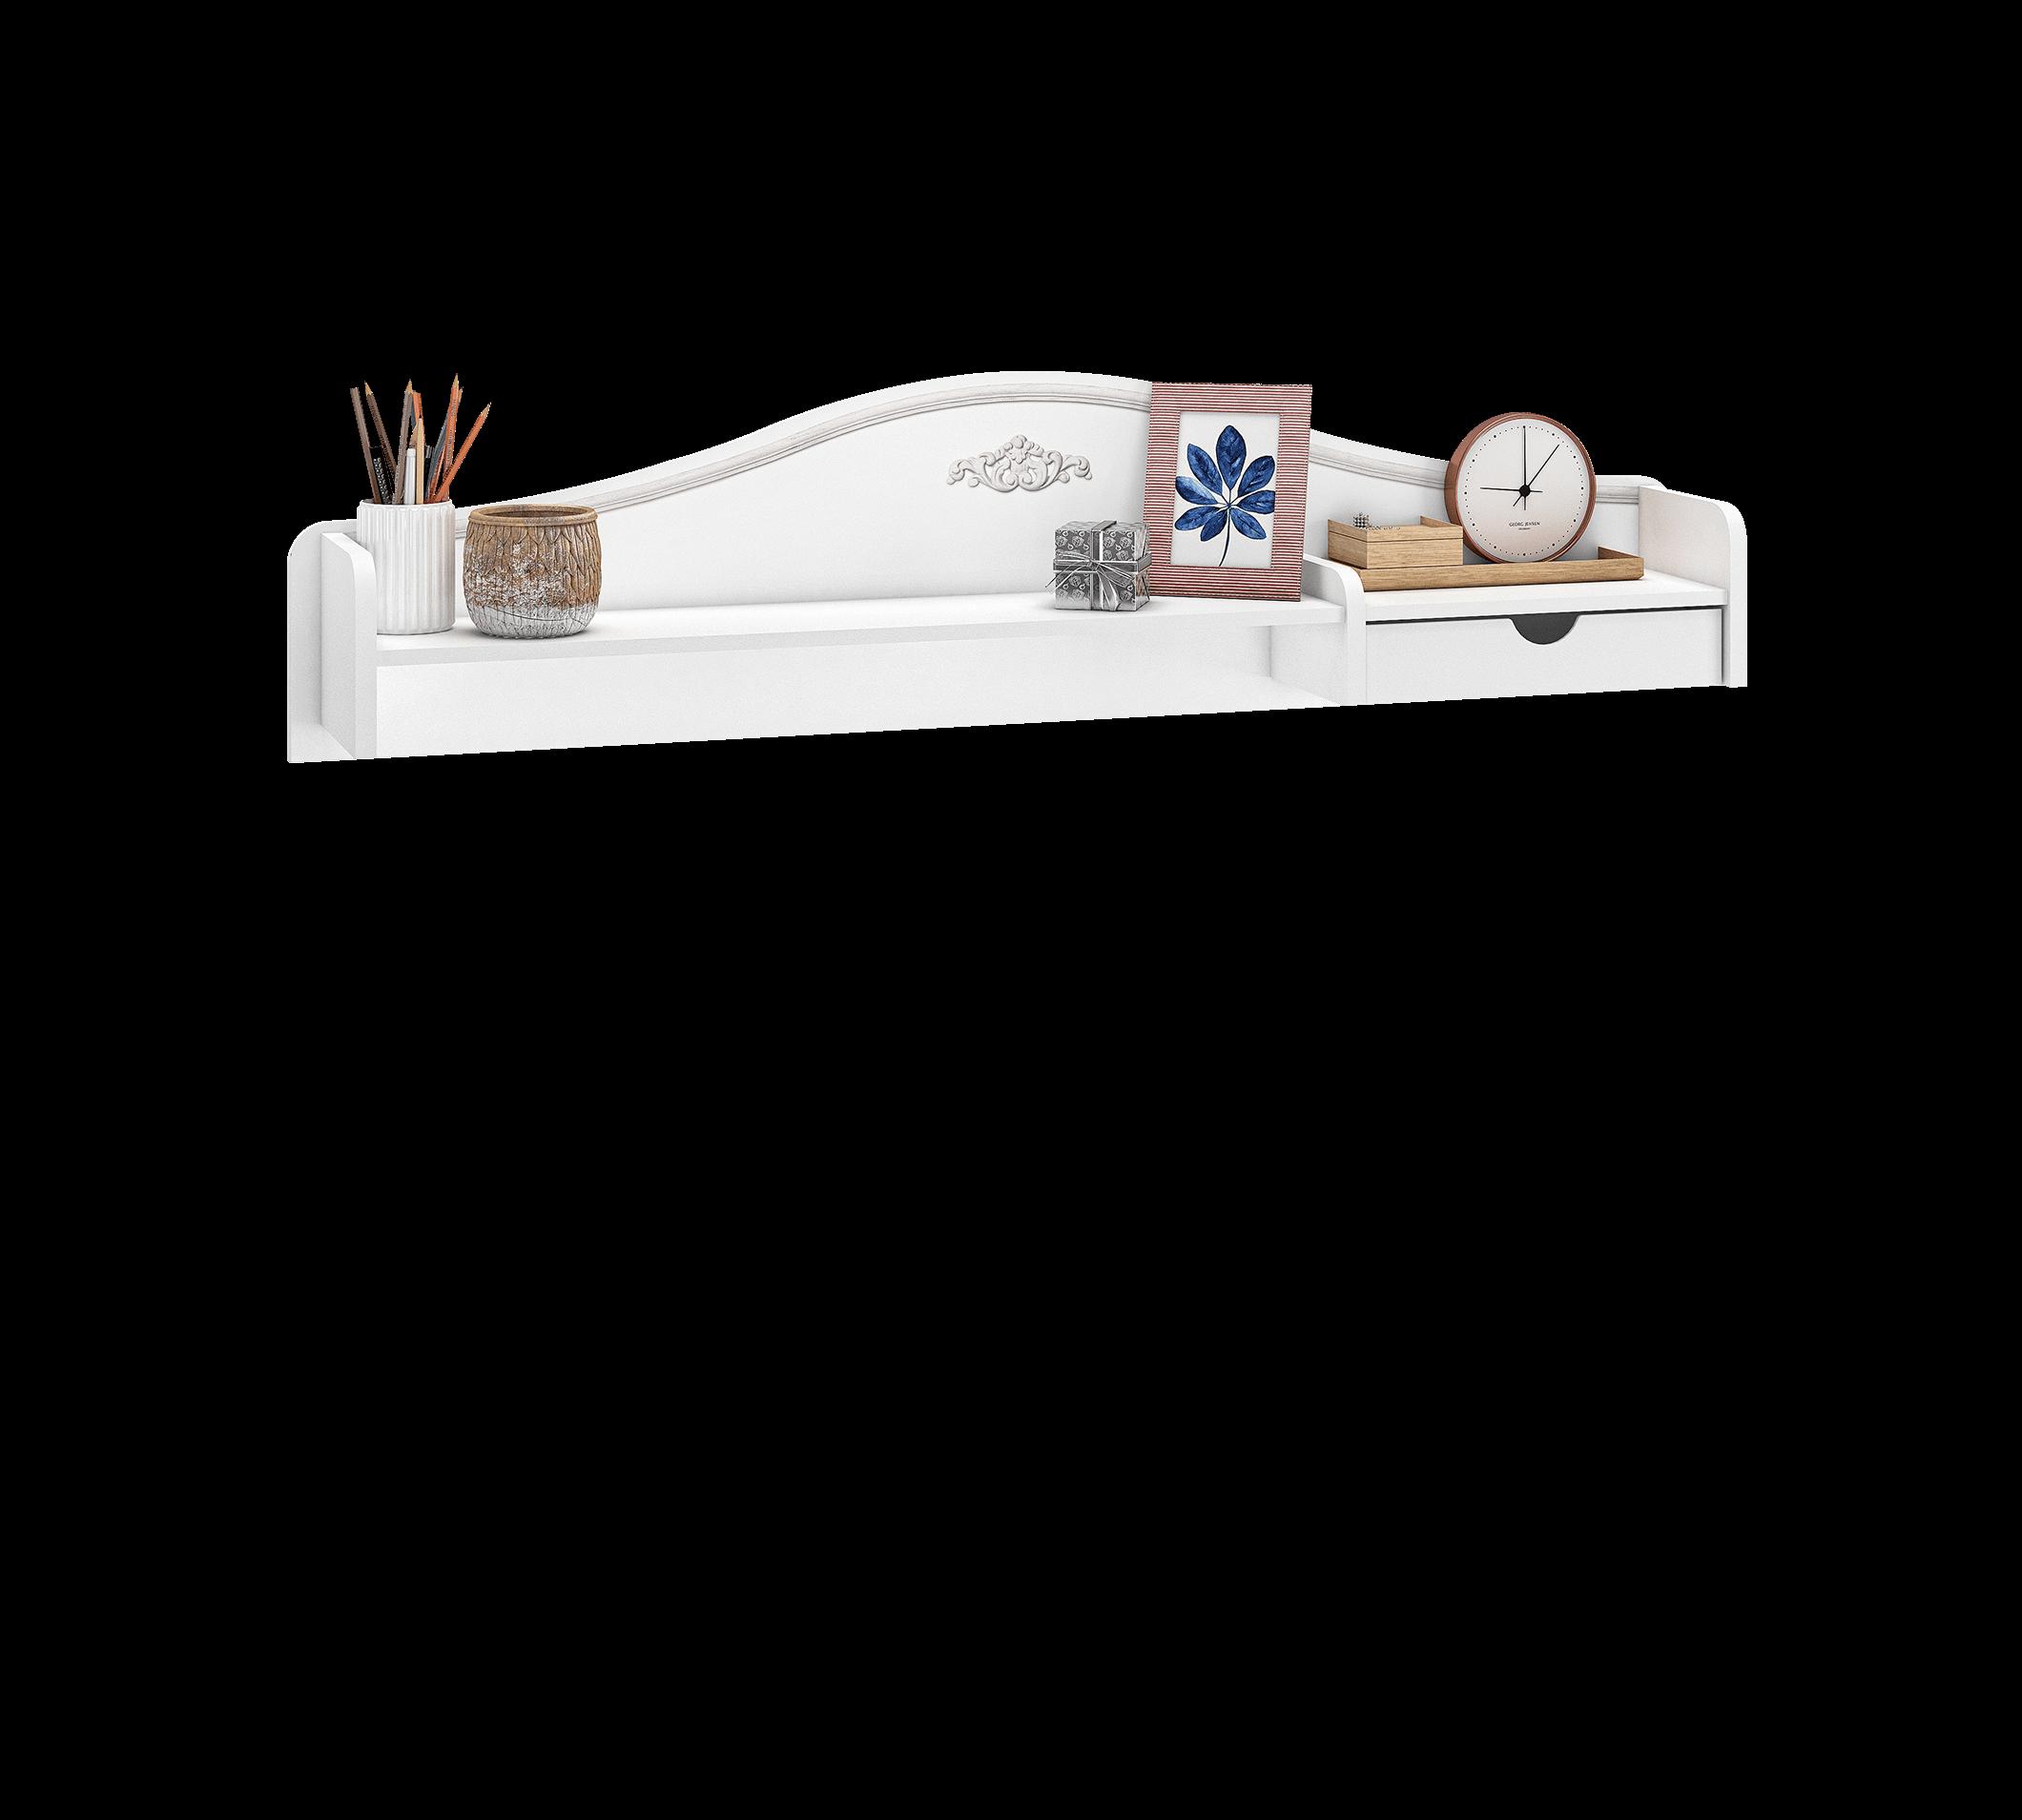 Etajera suspendata din pal, pentru tineret Selena Grey Alb / Gri, l120xA18xH33 cm imagine